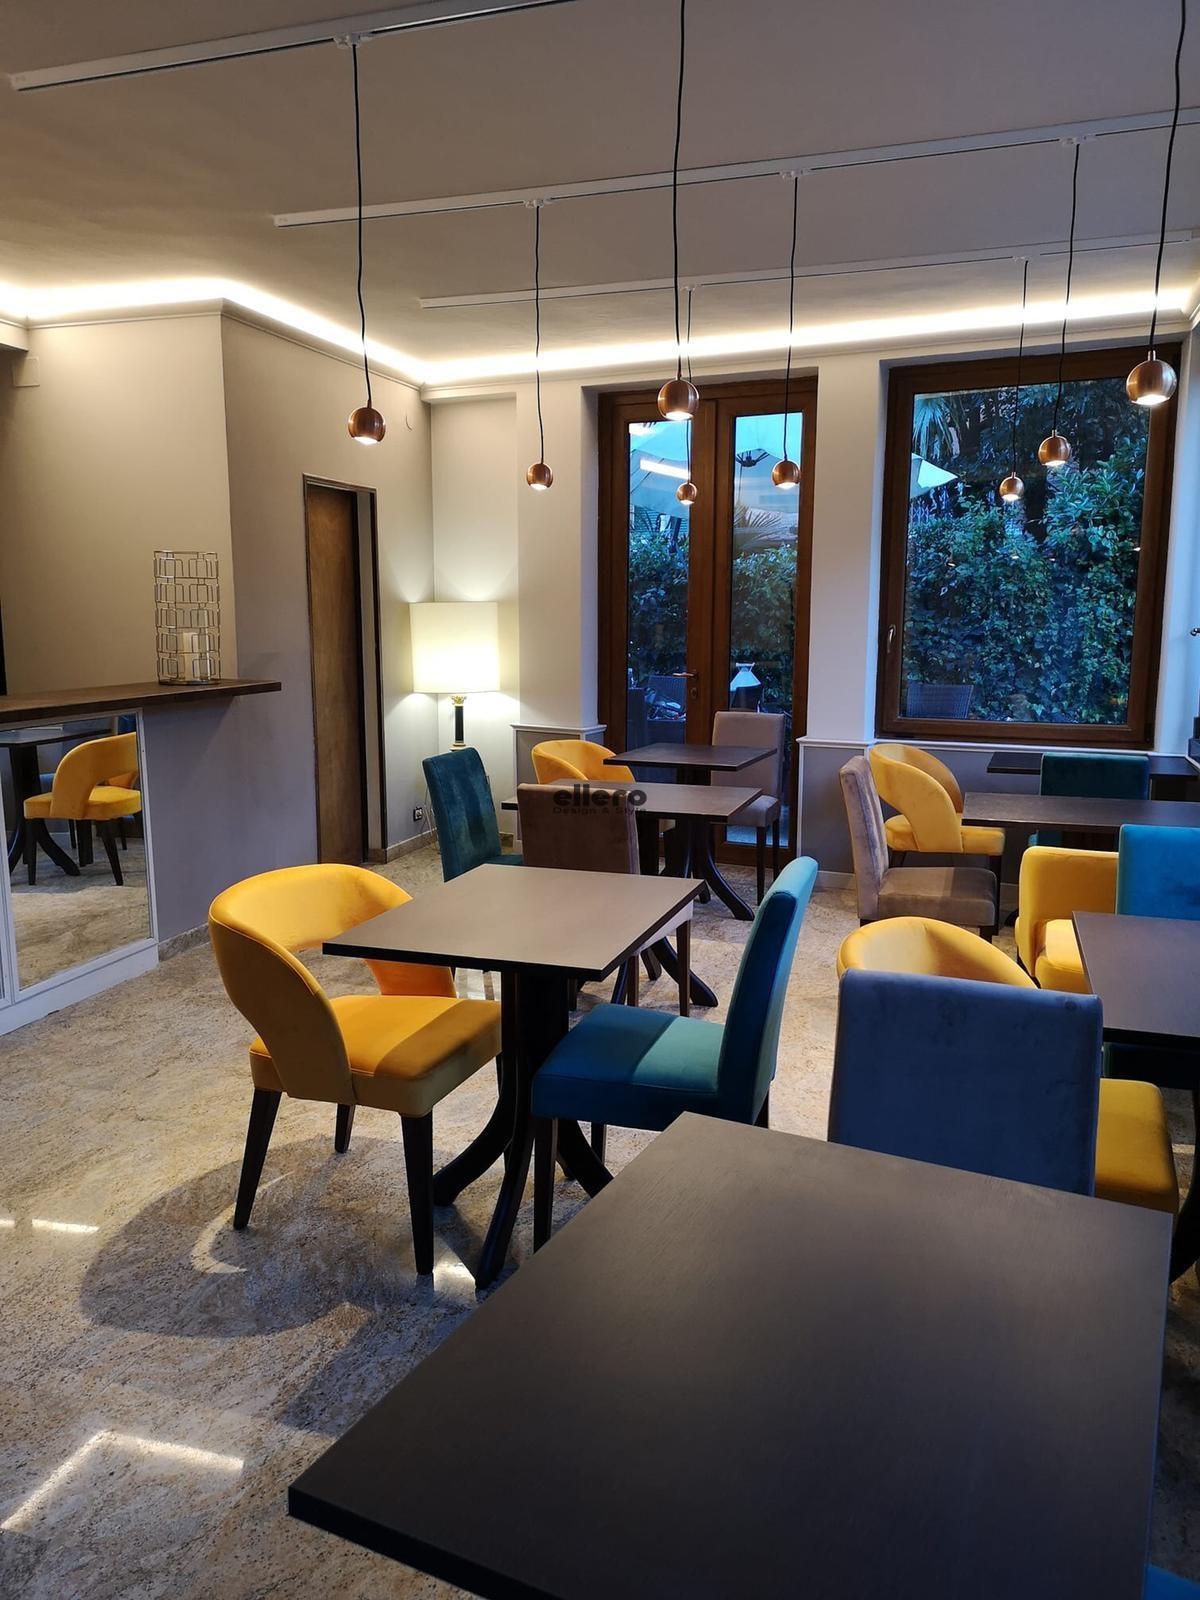 Bessy_armchair_Lory_chair_Hotel_Villa_Stella_Lido_di_Venezia2